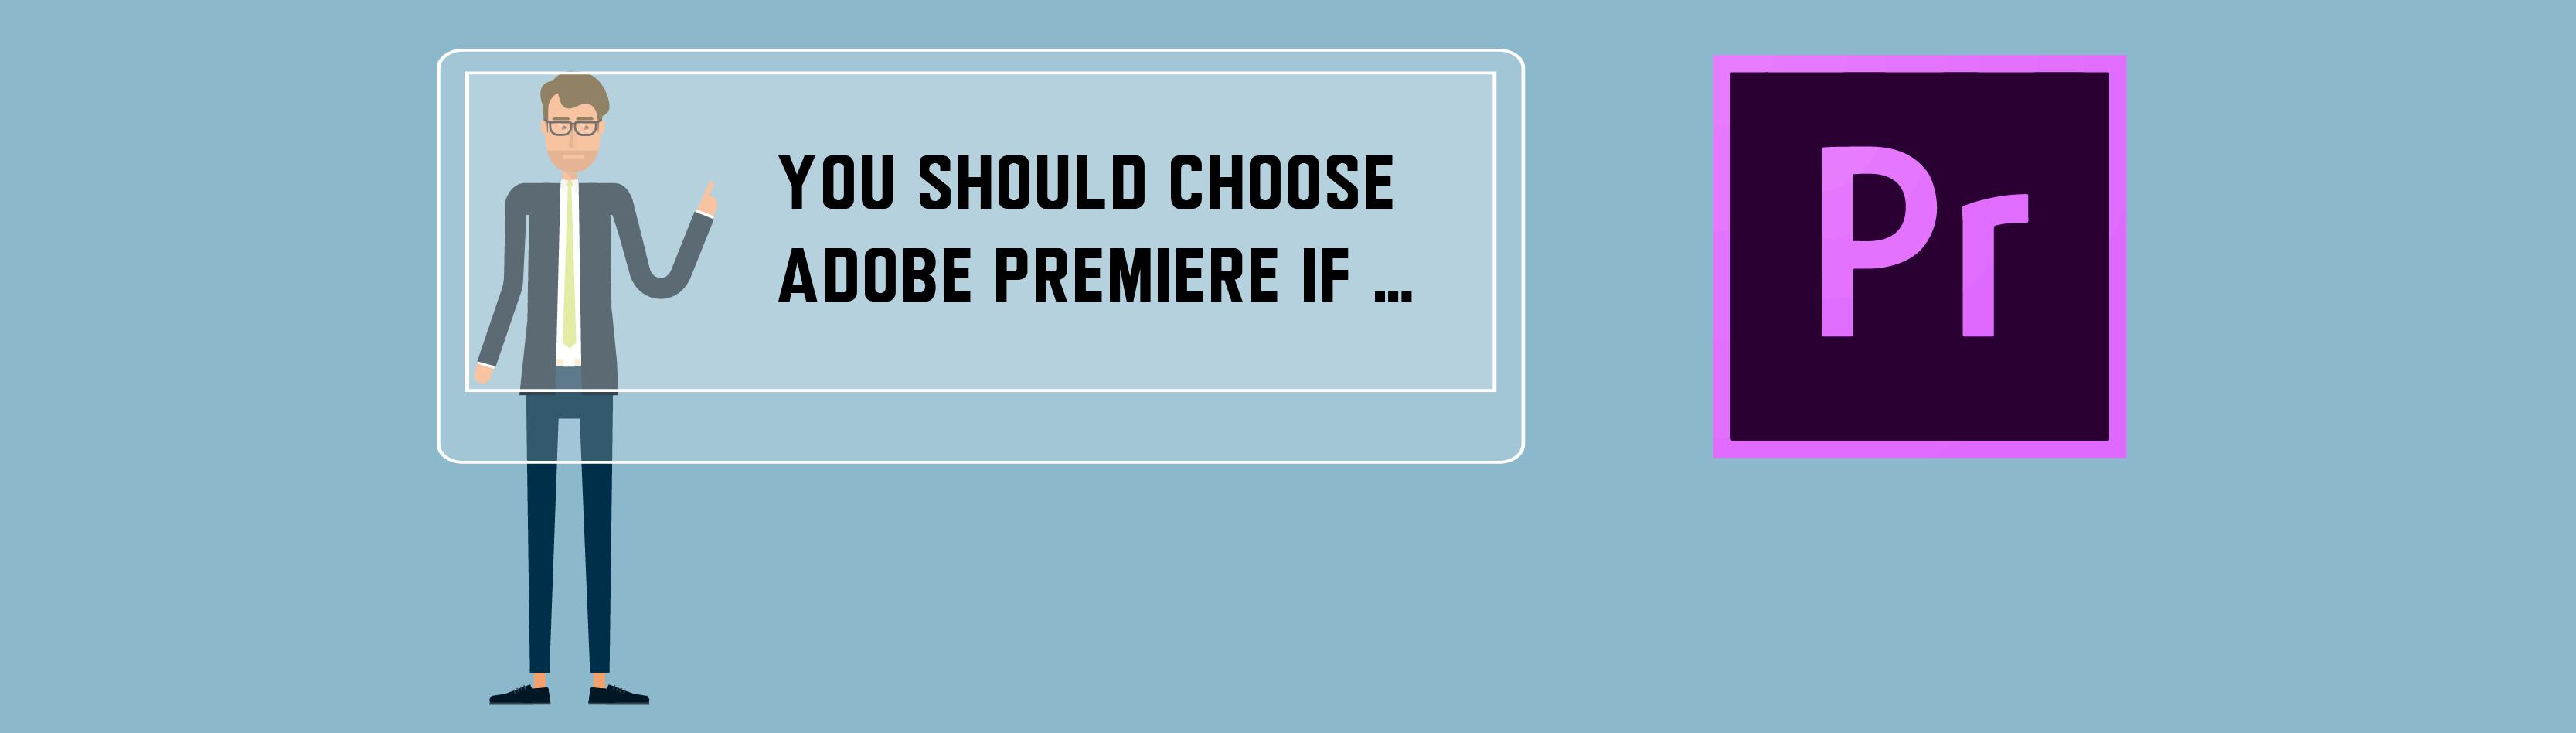 Use Adobe Premiere if